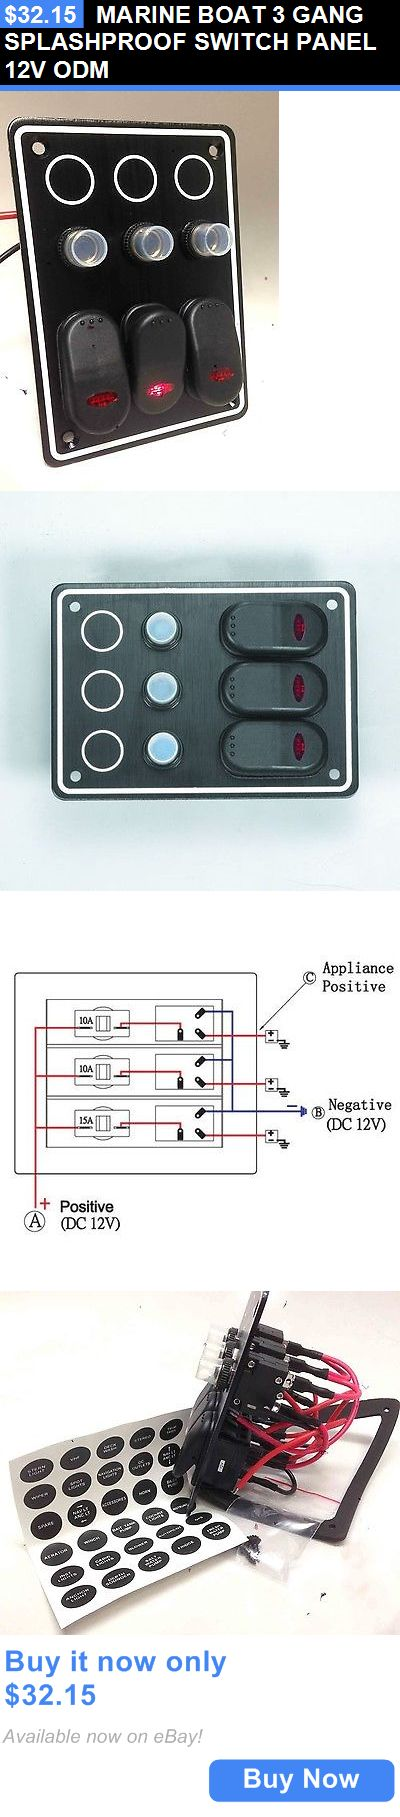 boat parts: Marine Boat 3 Gang Splashproof Switch Panel 12V Odm BUY IT NOW ONLY: $32.15